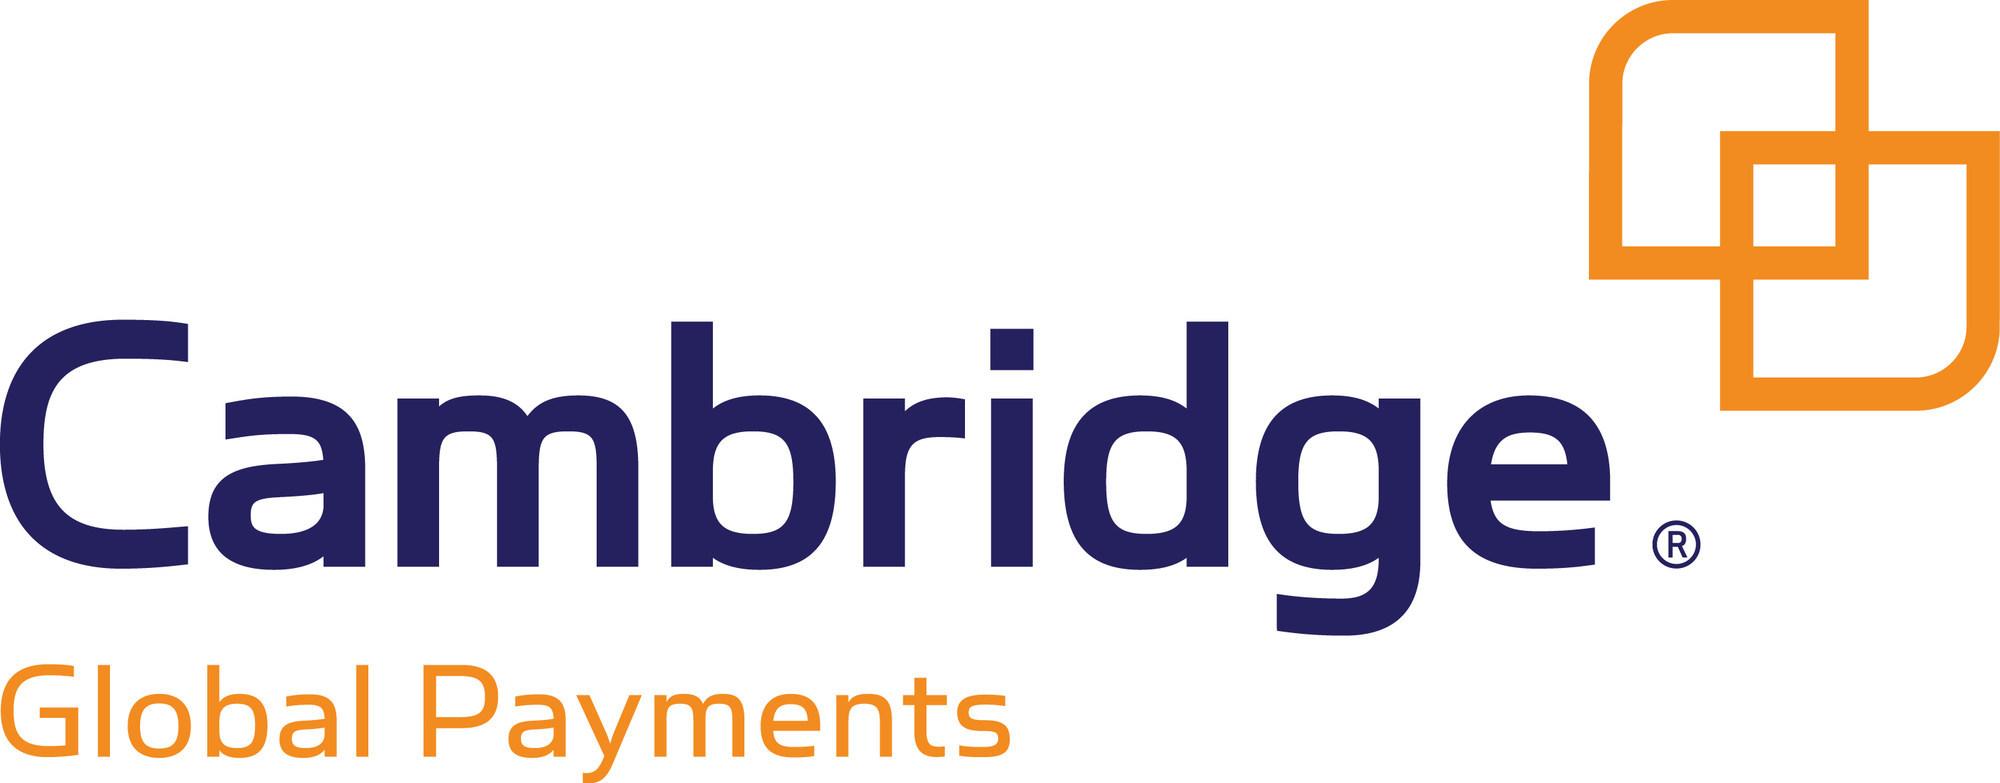 Cambridge_Global_Payments_logo.jpg